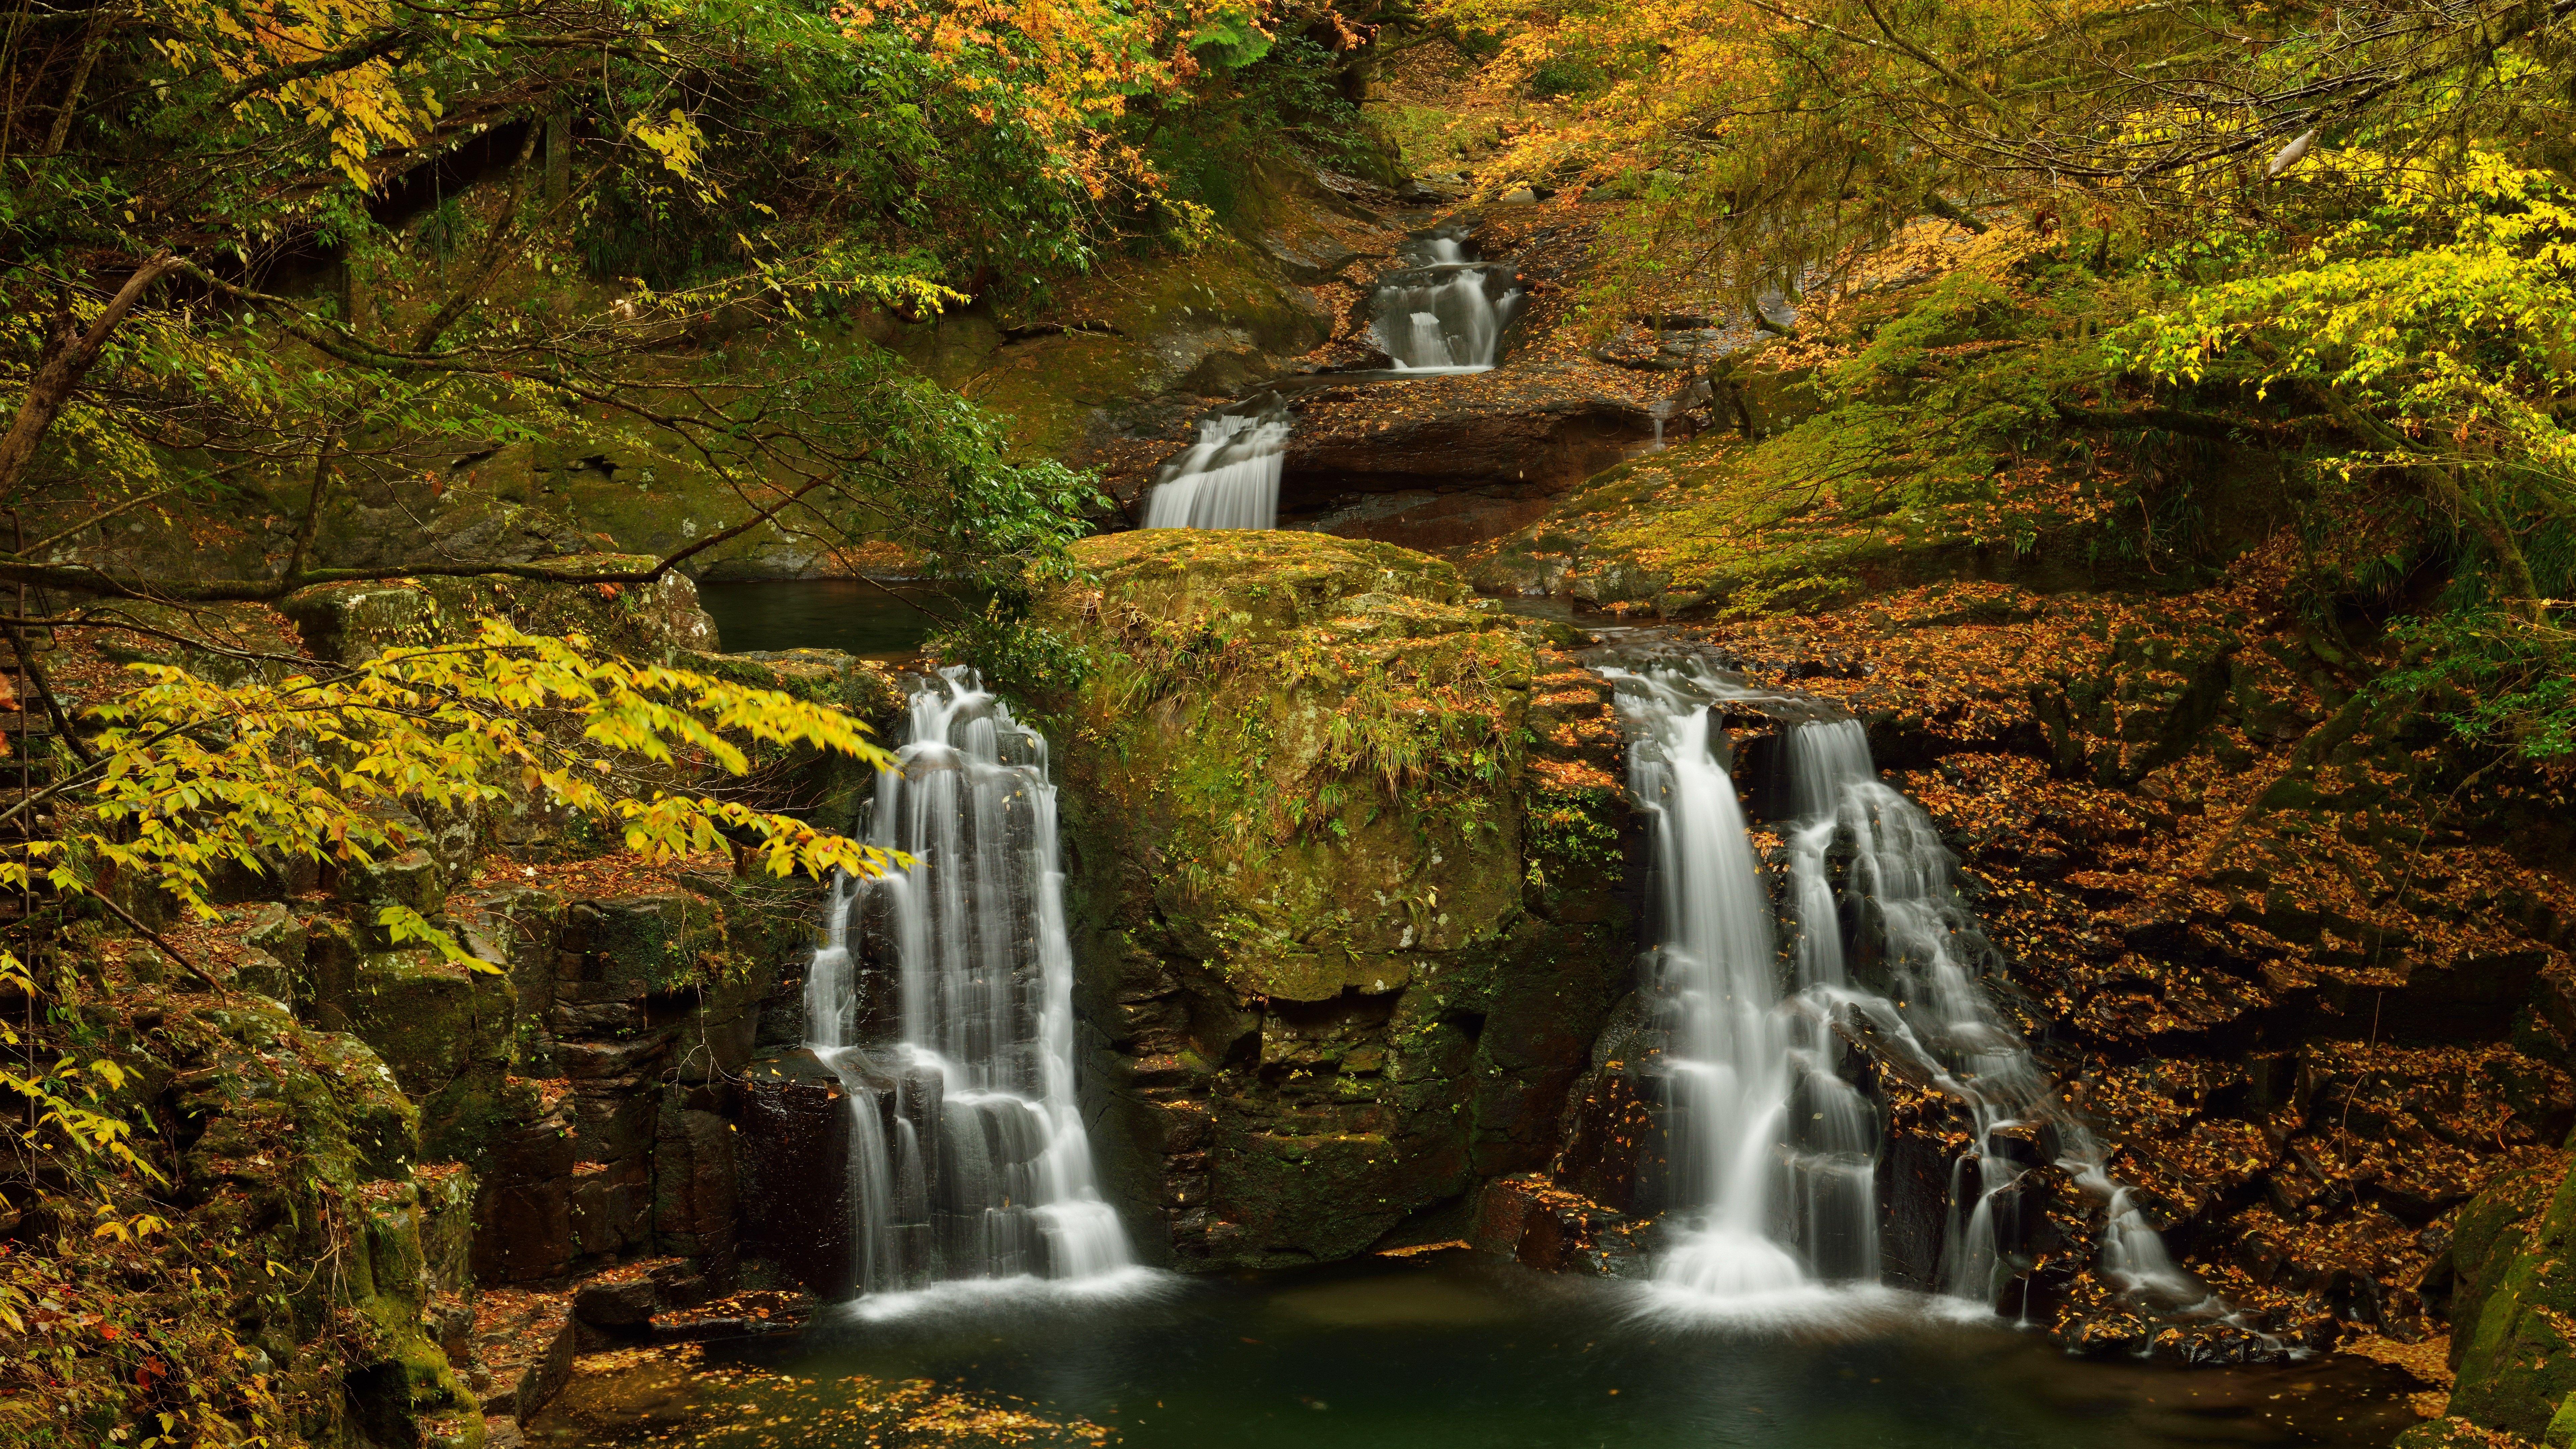 Full Hd 8k Wallpaper Waterfall Forest Waterfall Wallpaper